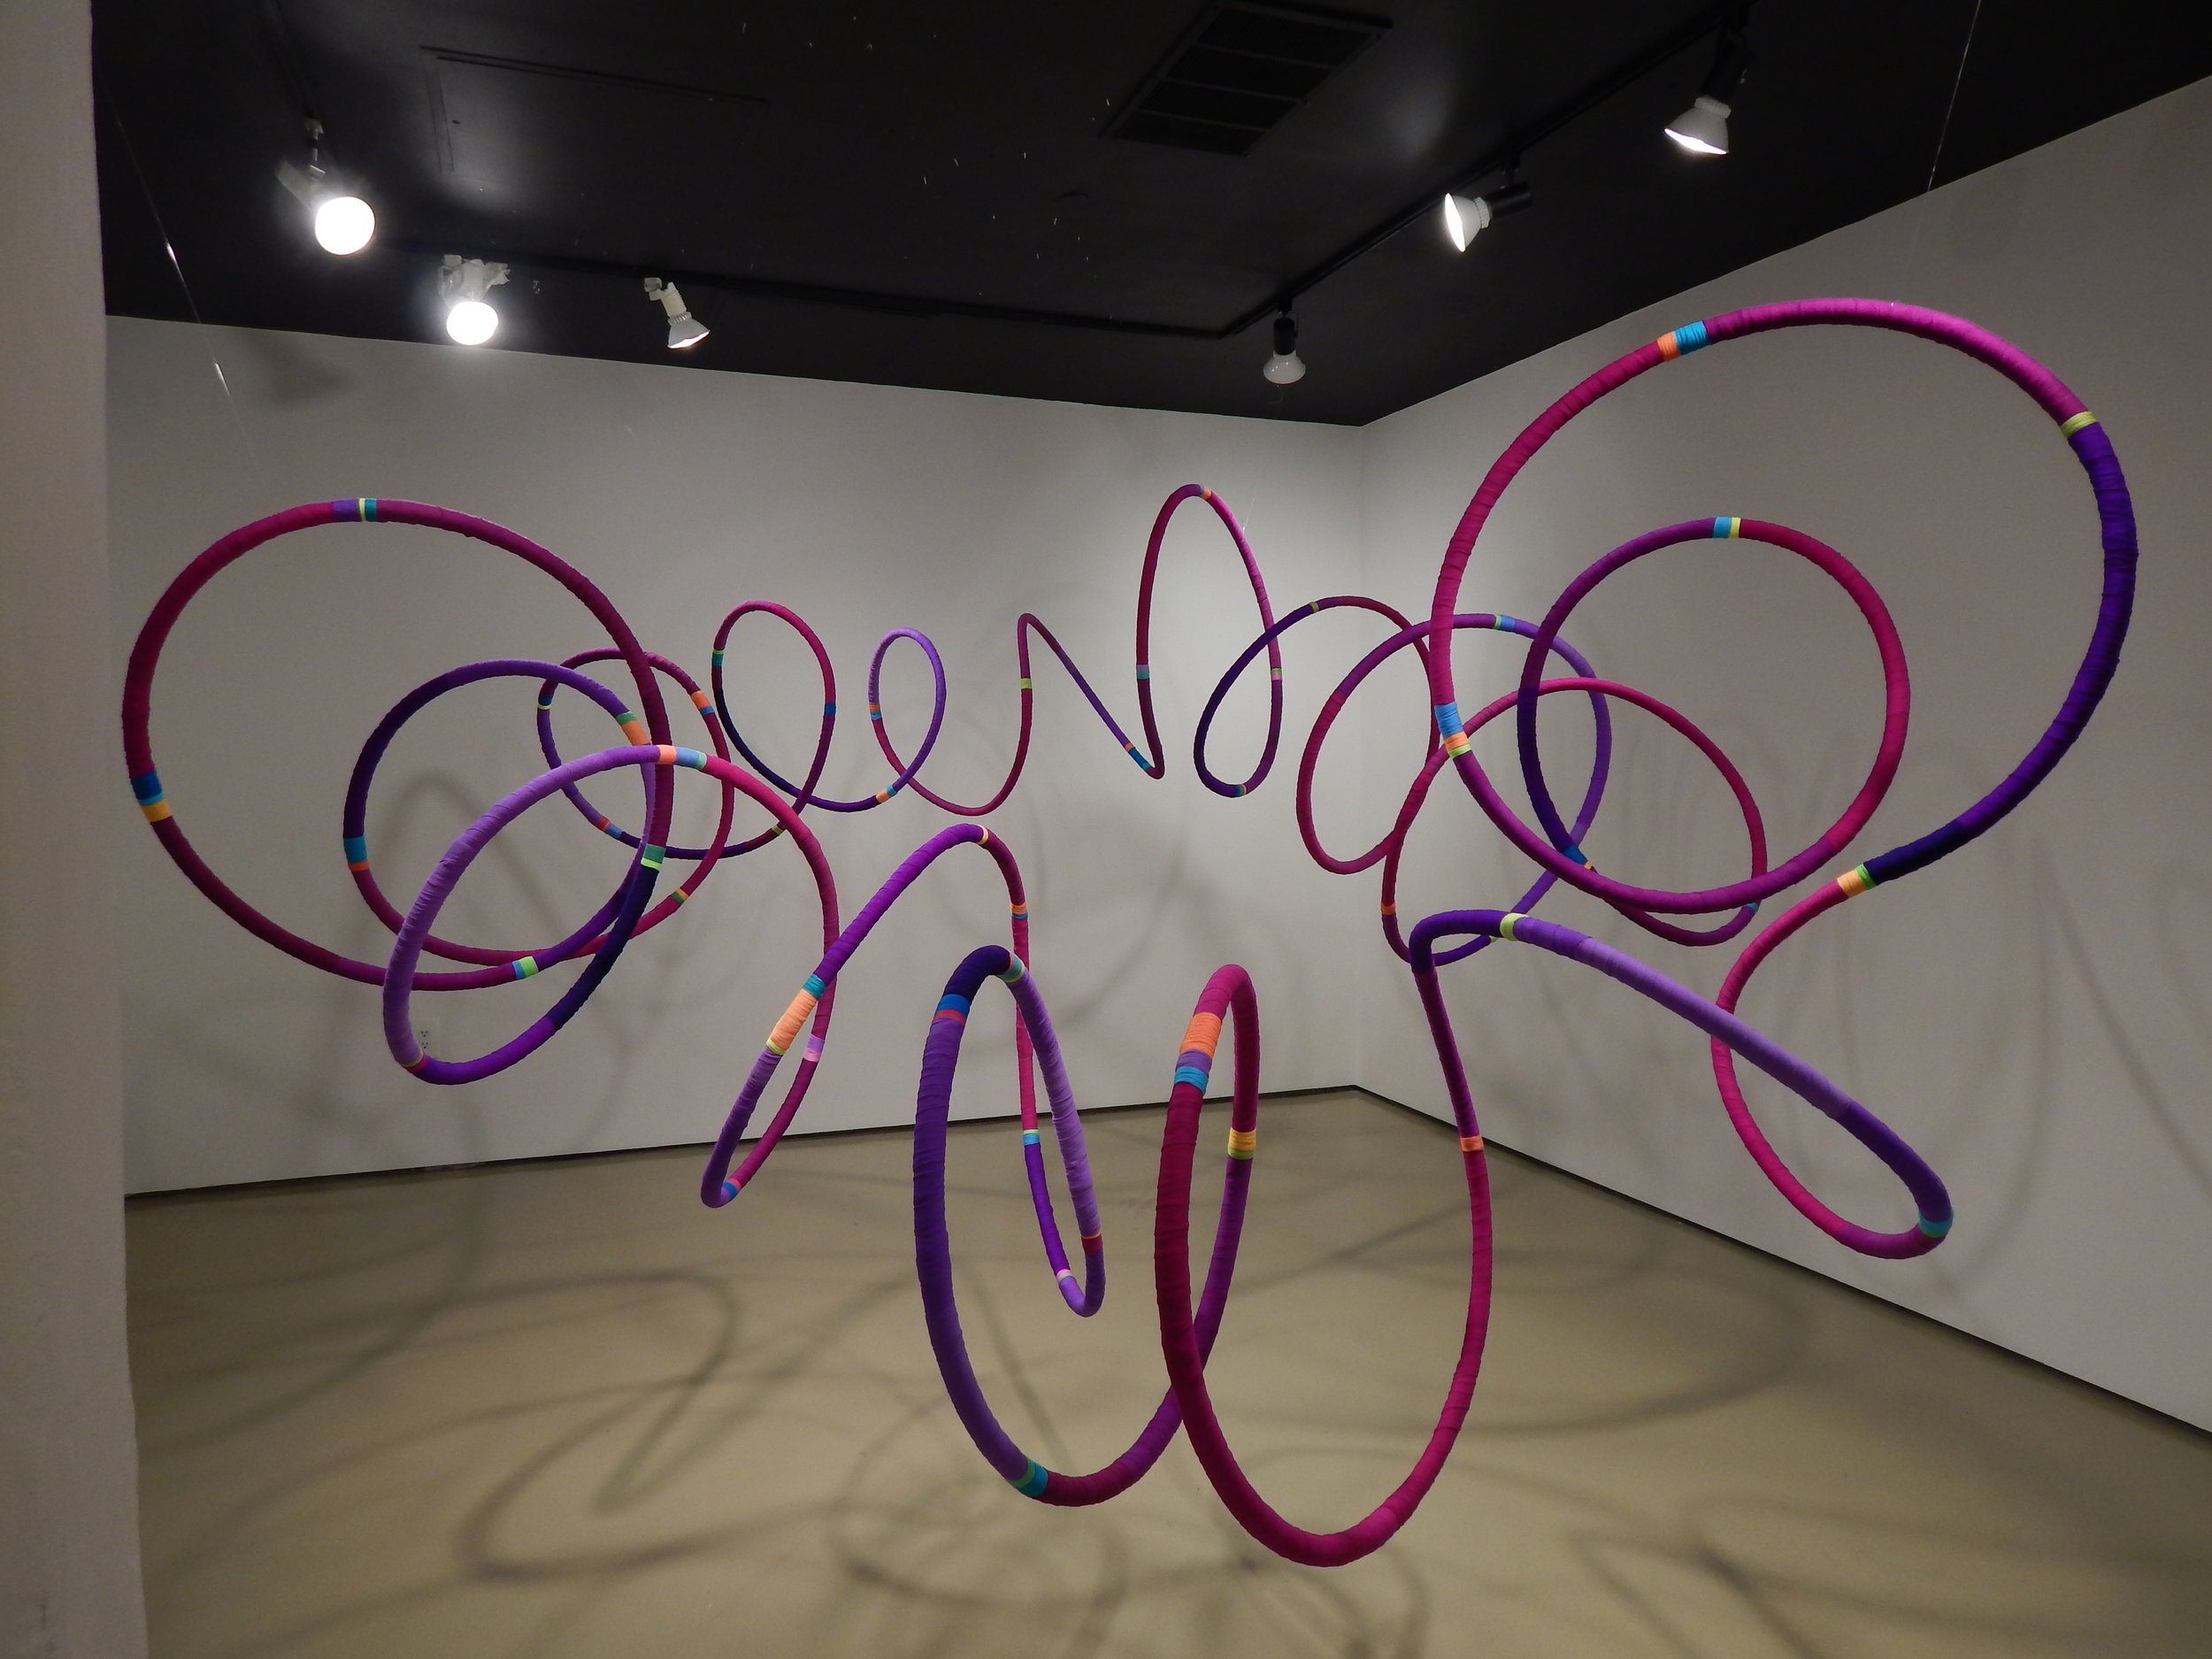 Judy Thomas, 'Cadence', 2016, PEX, hosiery